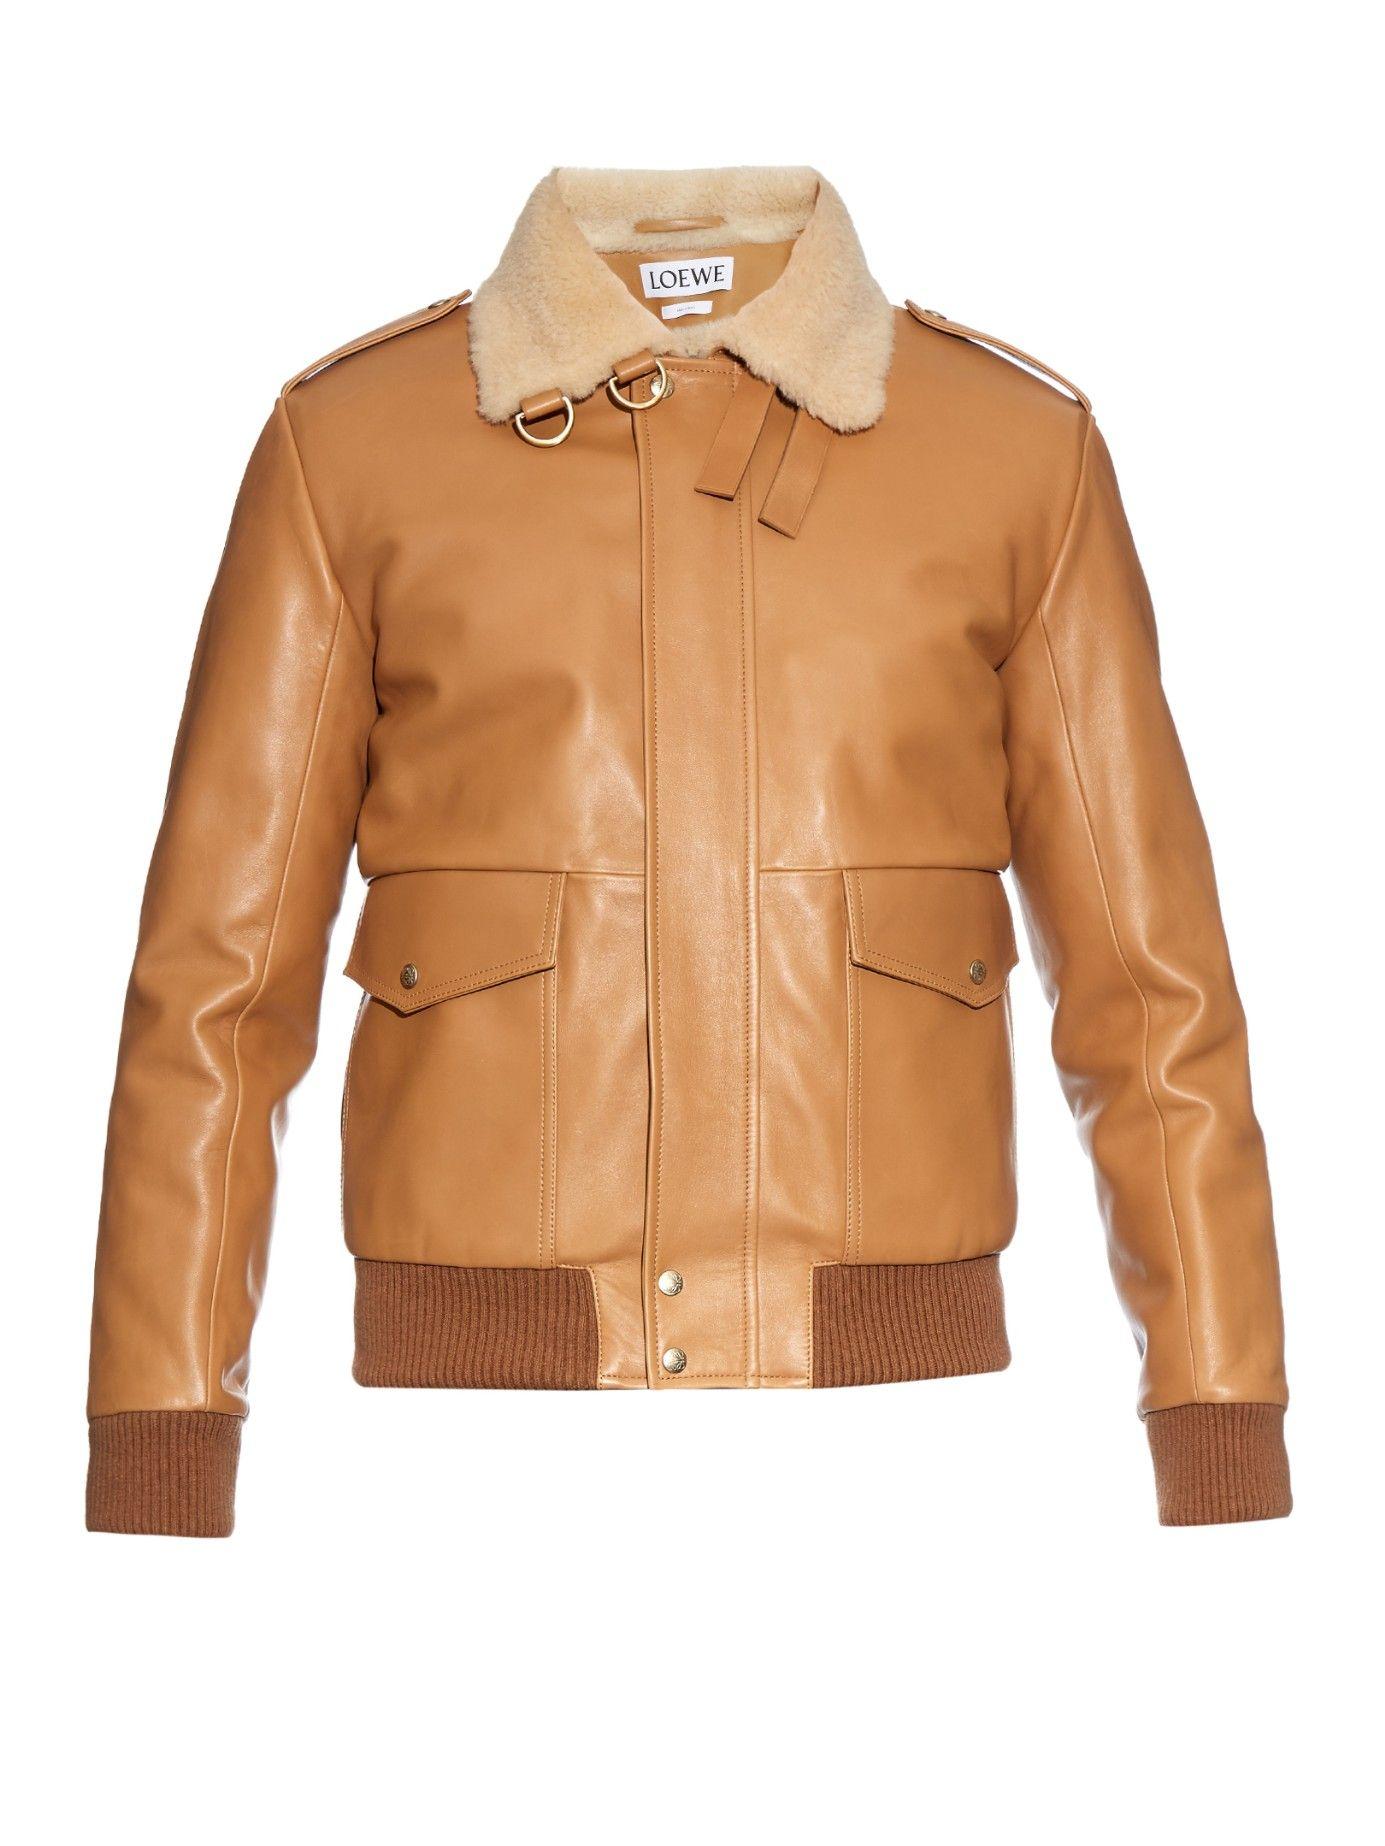 Sheepskincollar leather aviator jacket Loewe